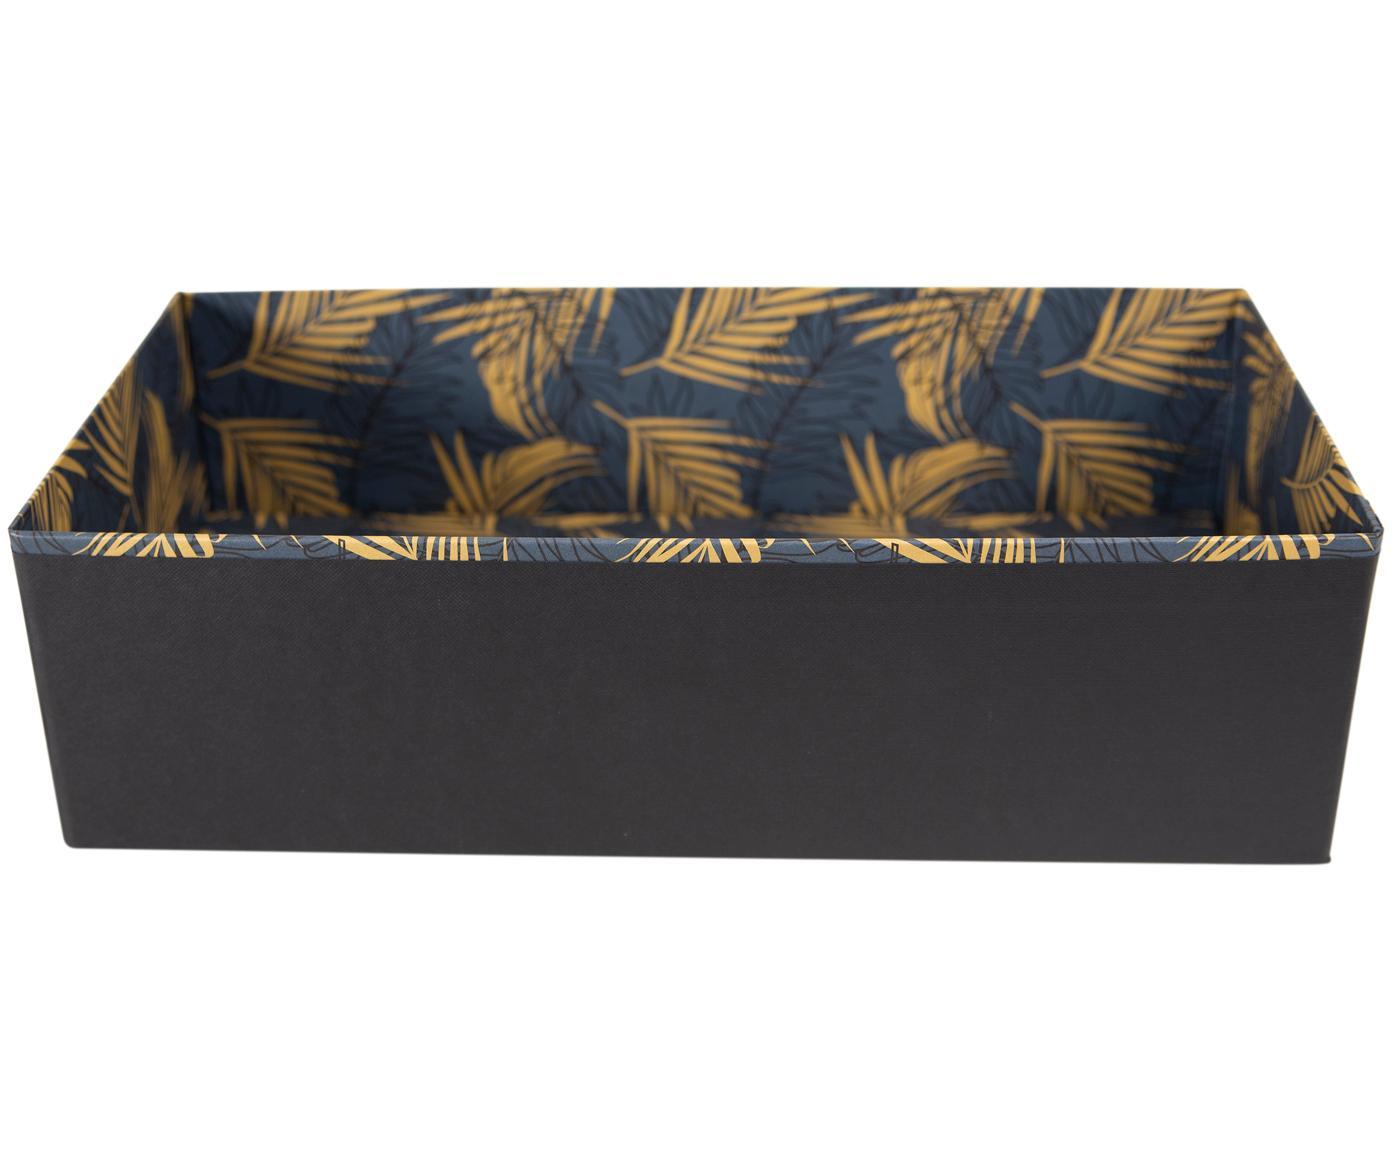 Organizer Drawer, Solido, cartone laminato, Dorato, blu grigio, Larg. 36 x Alt. 10 cm